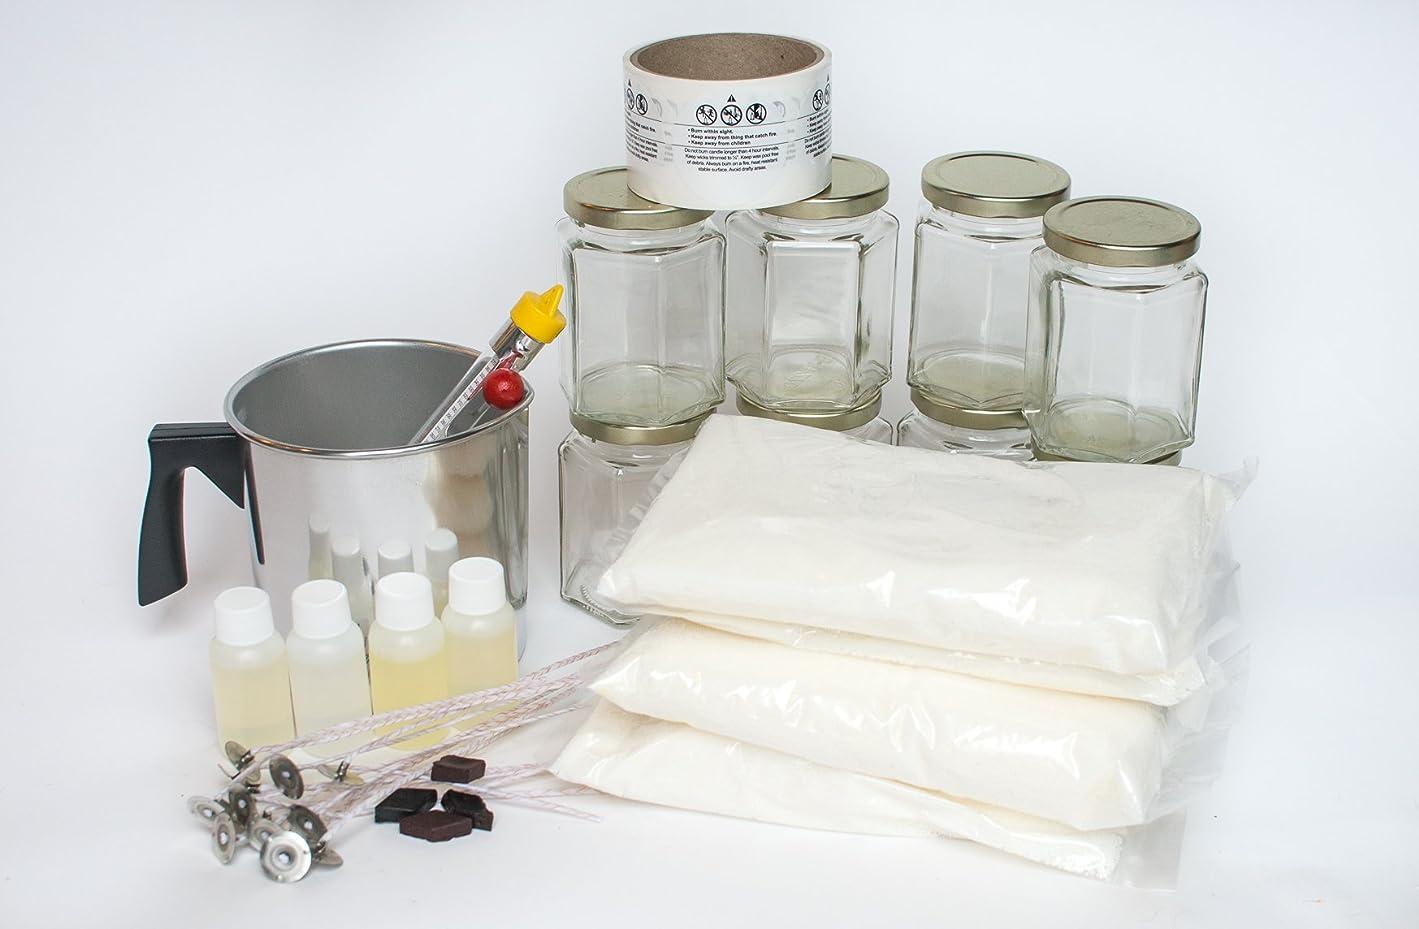 Palm Wax Candle Making Kit i72841822727473